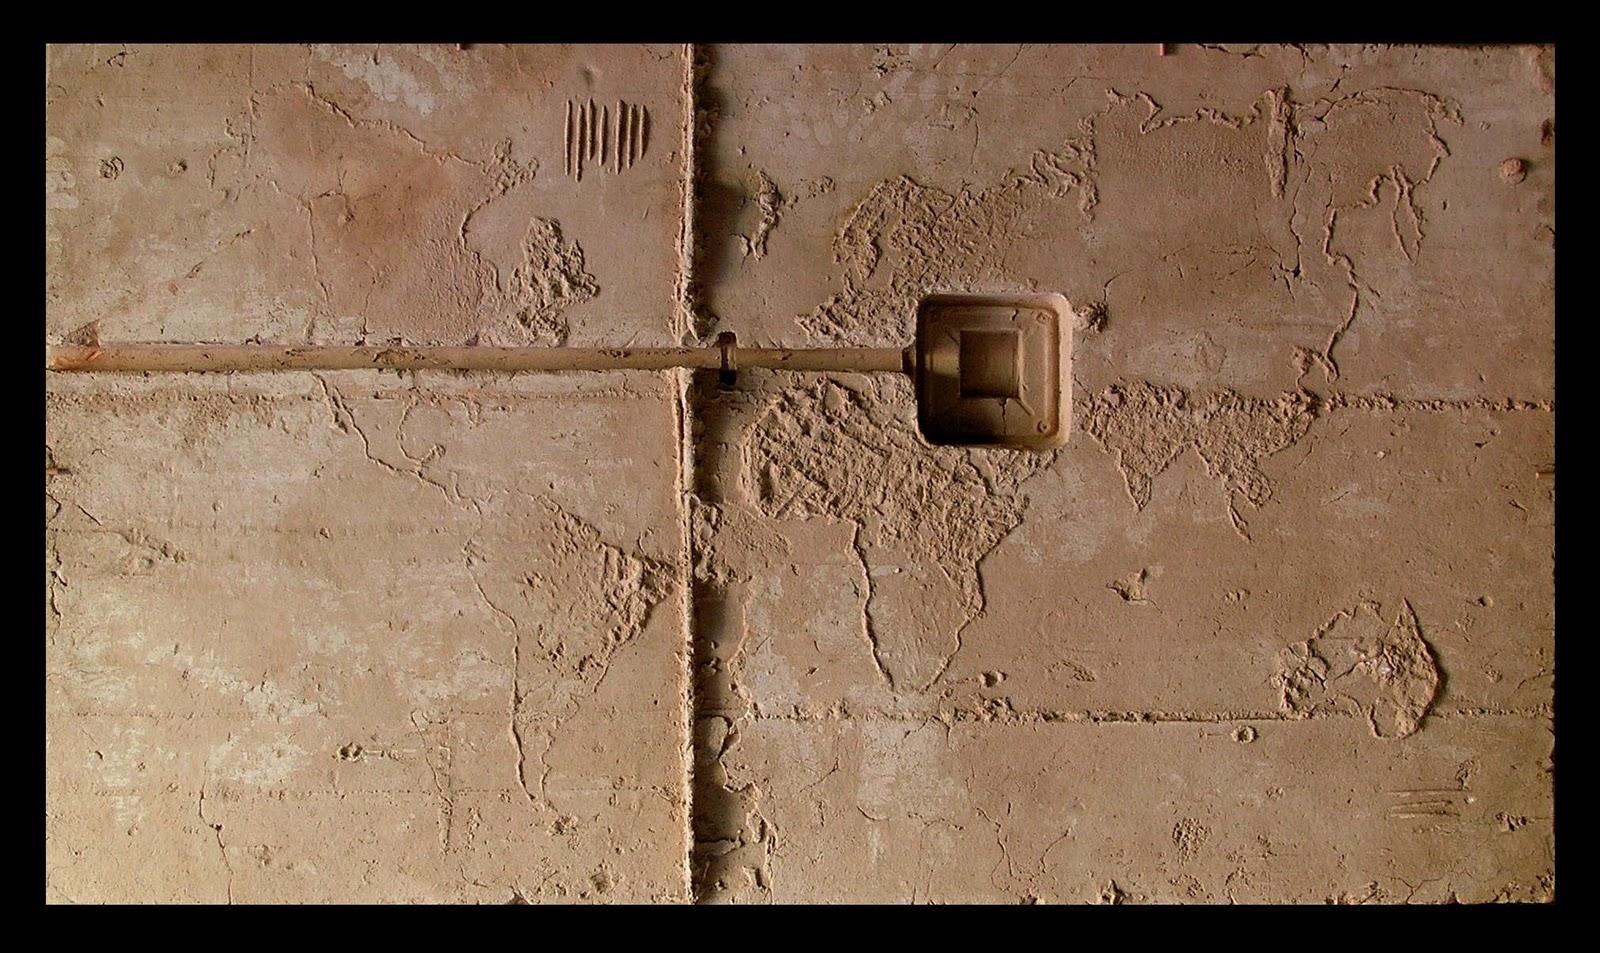 Del Mundo y su muro, 2007. Terracota. 74 x 130 x 9 cm